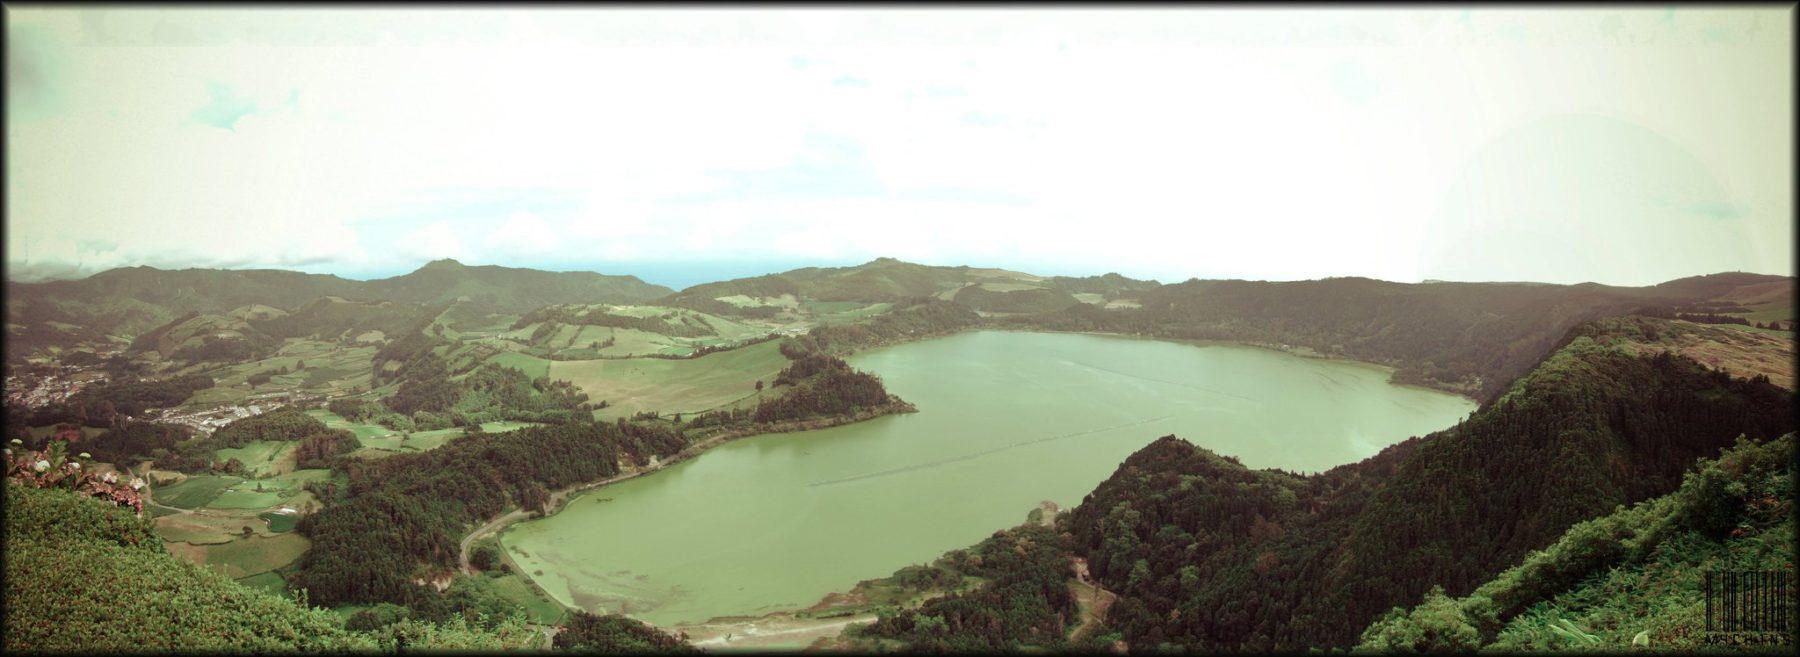 Lagoa das Furnas – Miradouro Pico do Ferro